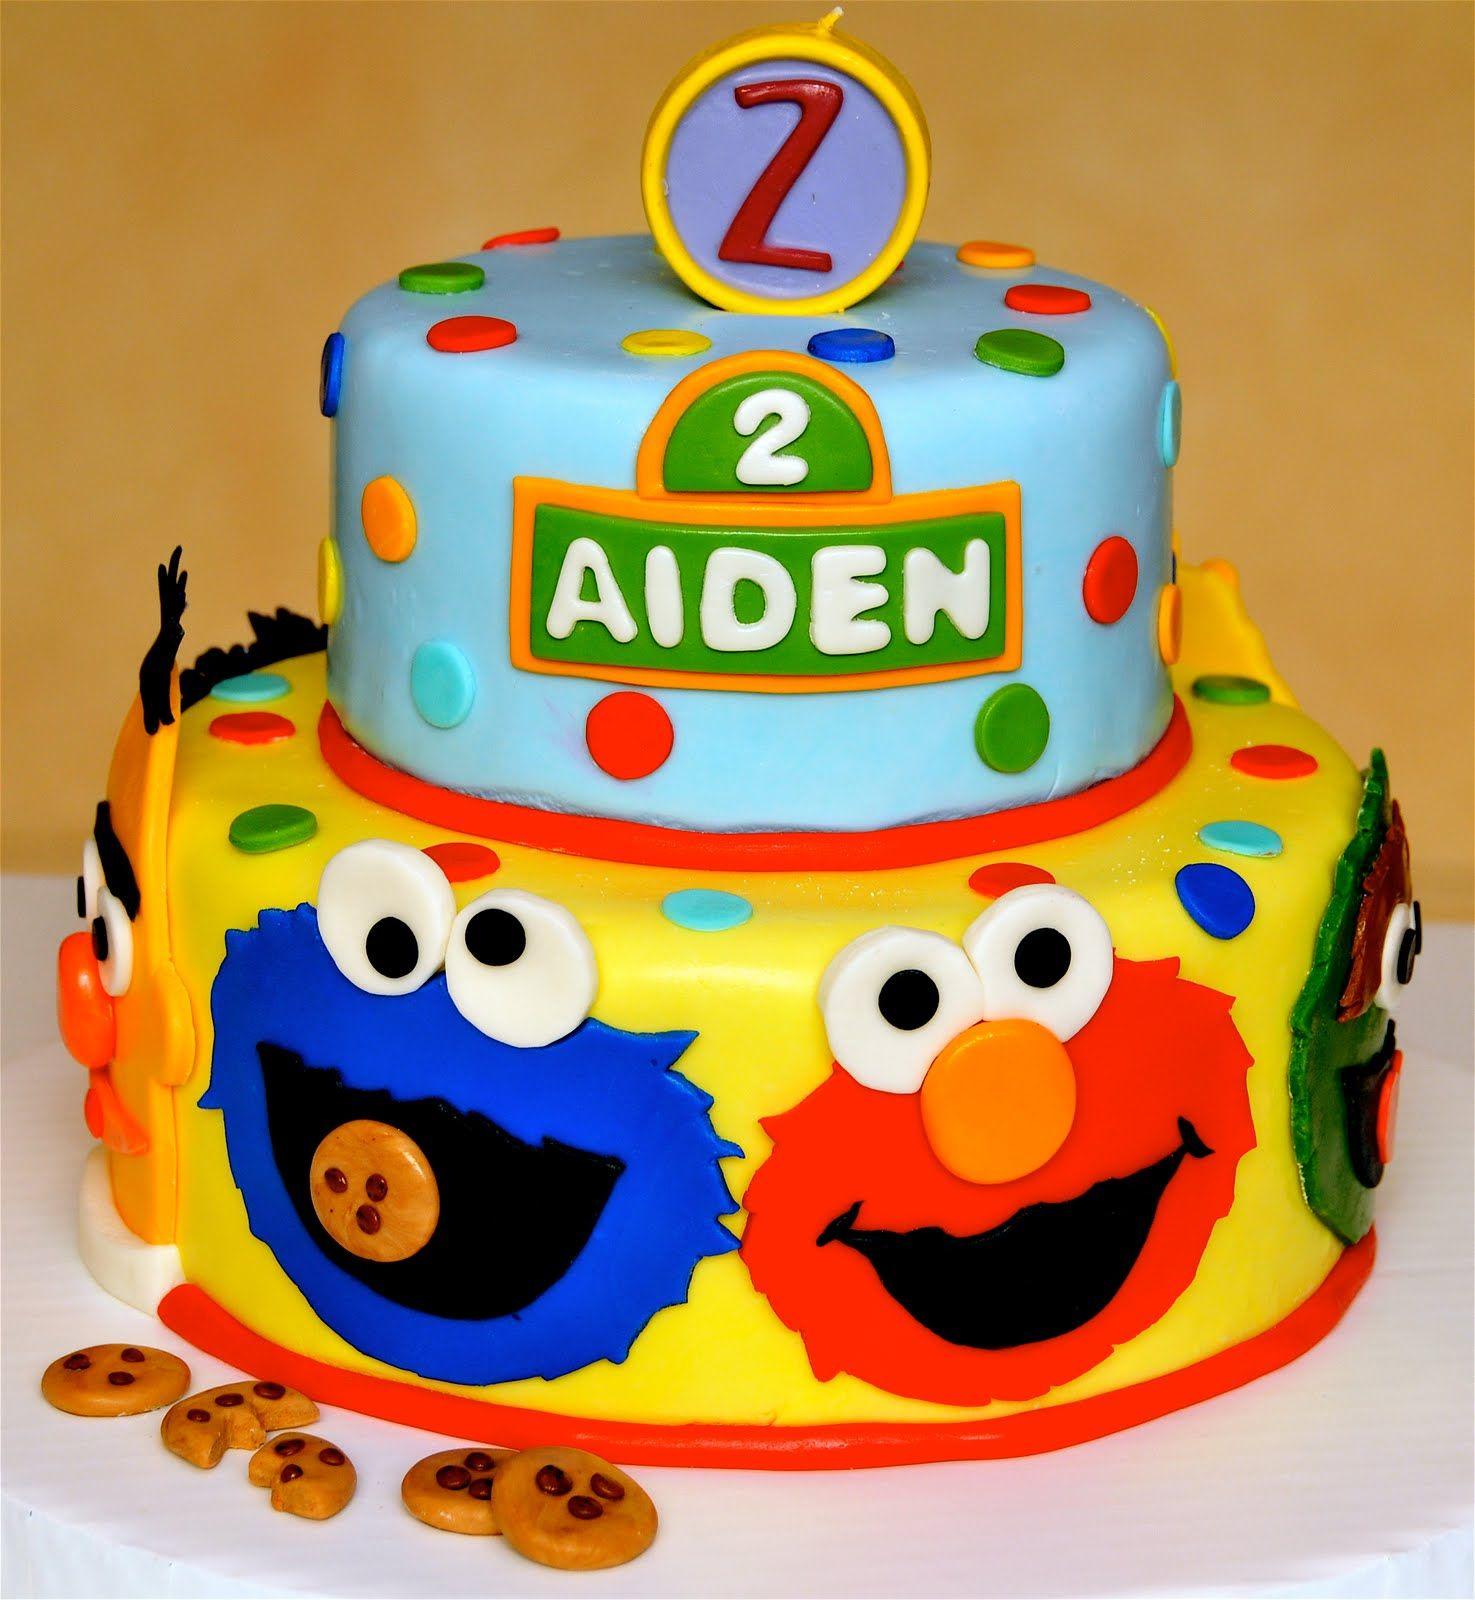 Cute Sesame Street birthday cake I wish my son still loved Elmo as